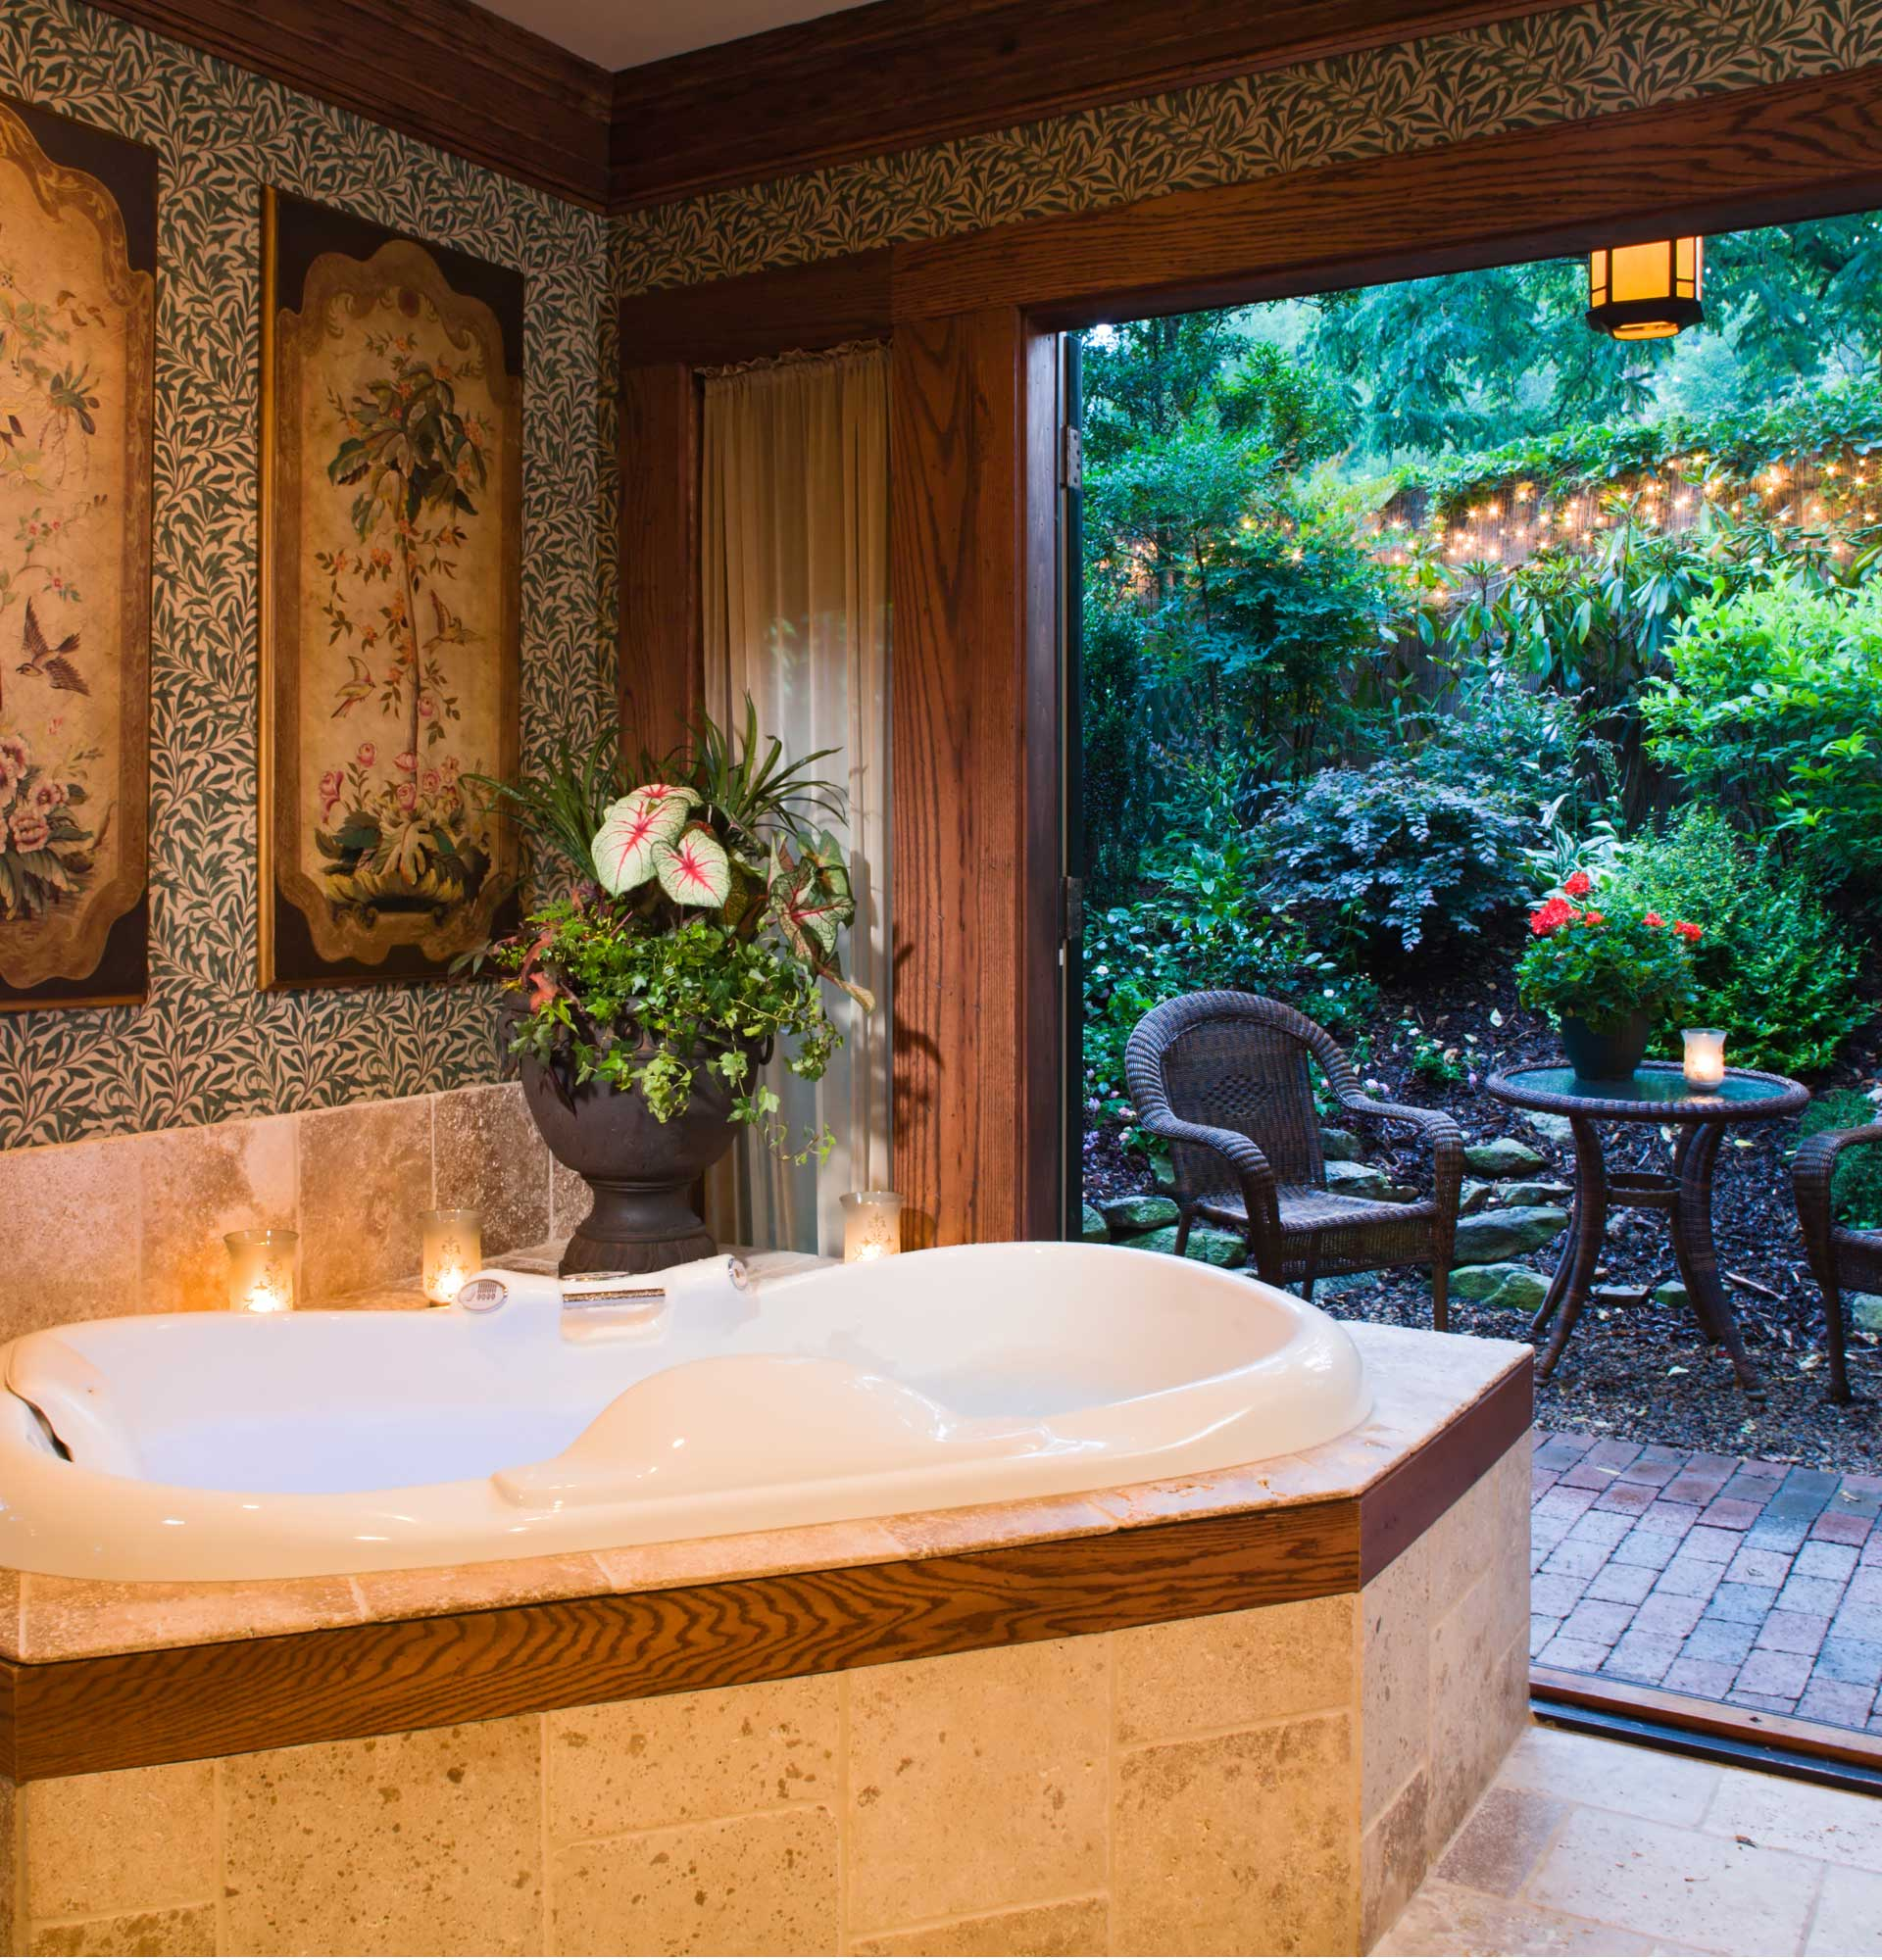 William Morris suite at Inn on Montford in Asheville